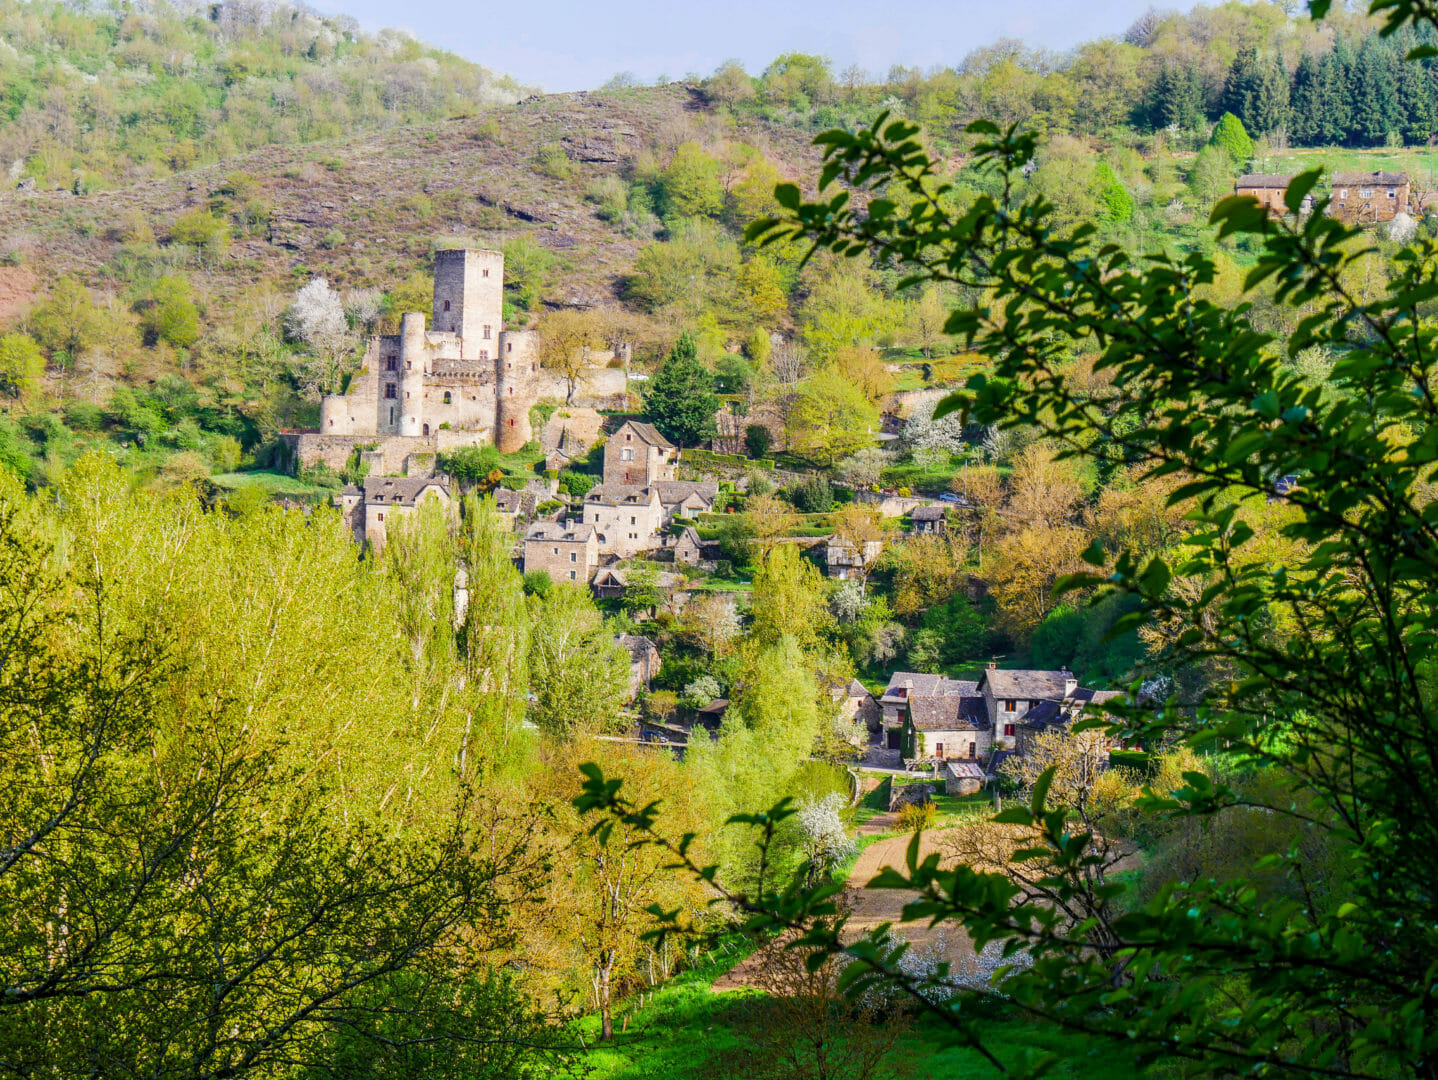 Belcastel Visiter la France hors des sentiers battus